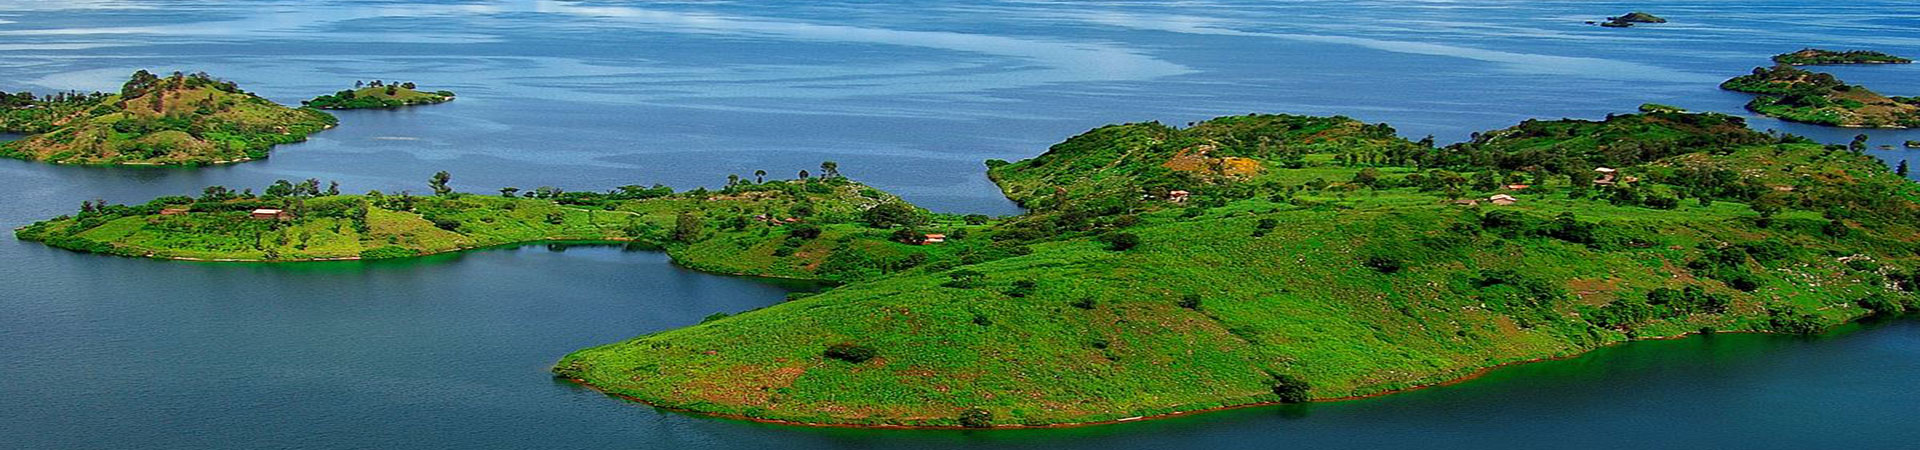 15-Day-Rwanda-Tour-Safaris